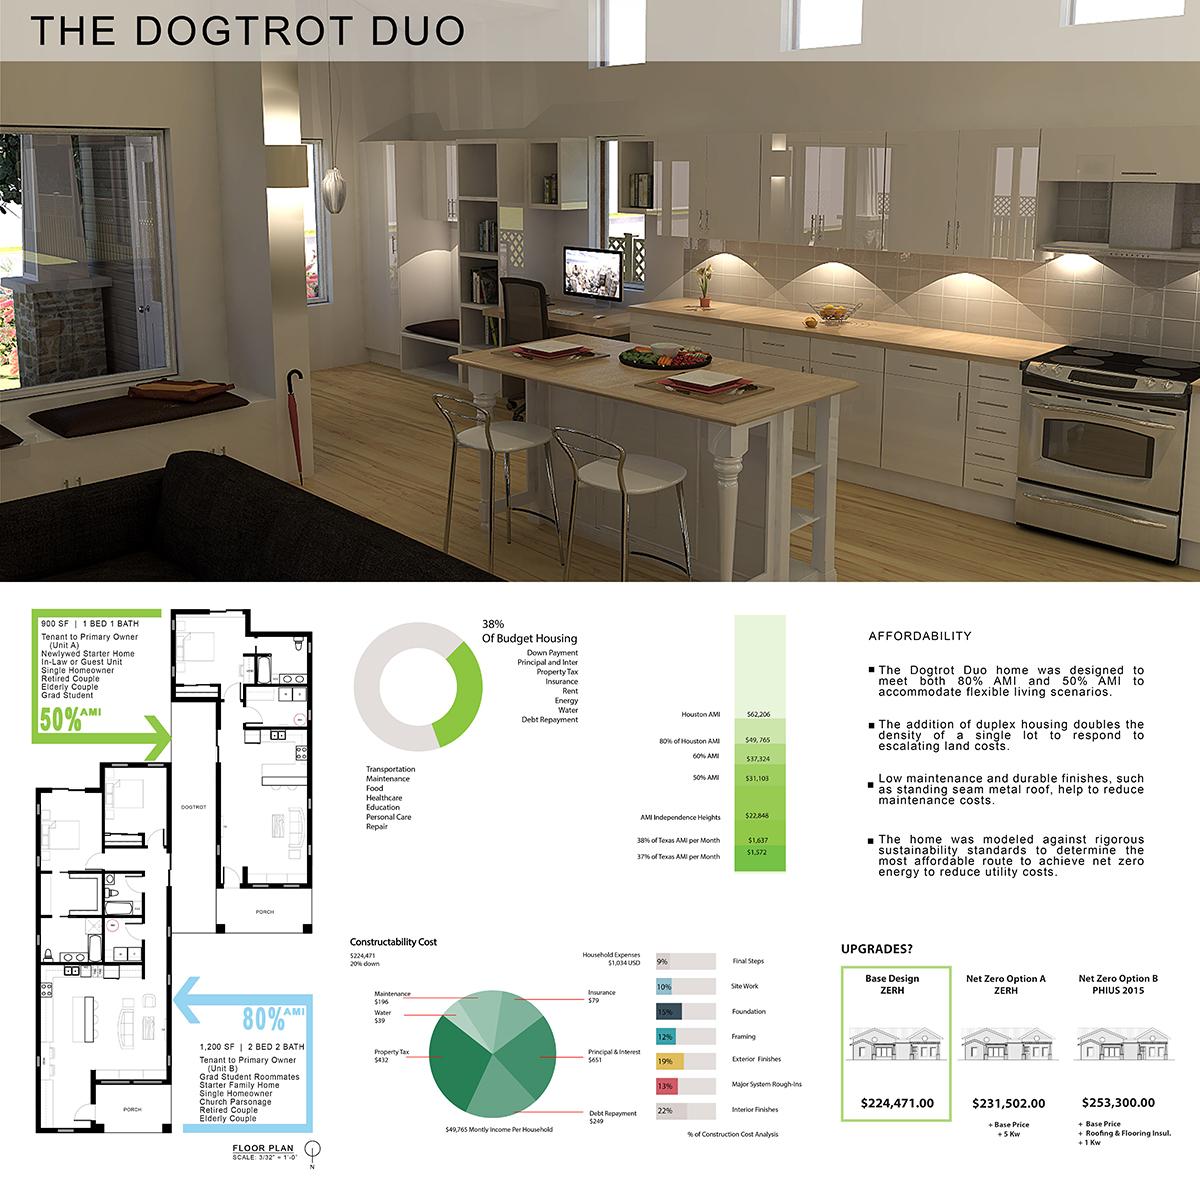 dogtrot_duo_-_affordability.jpg